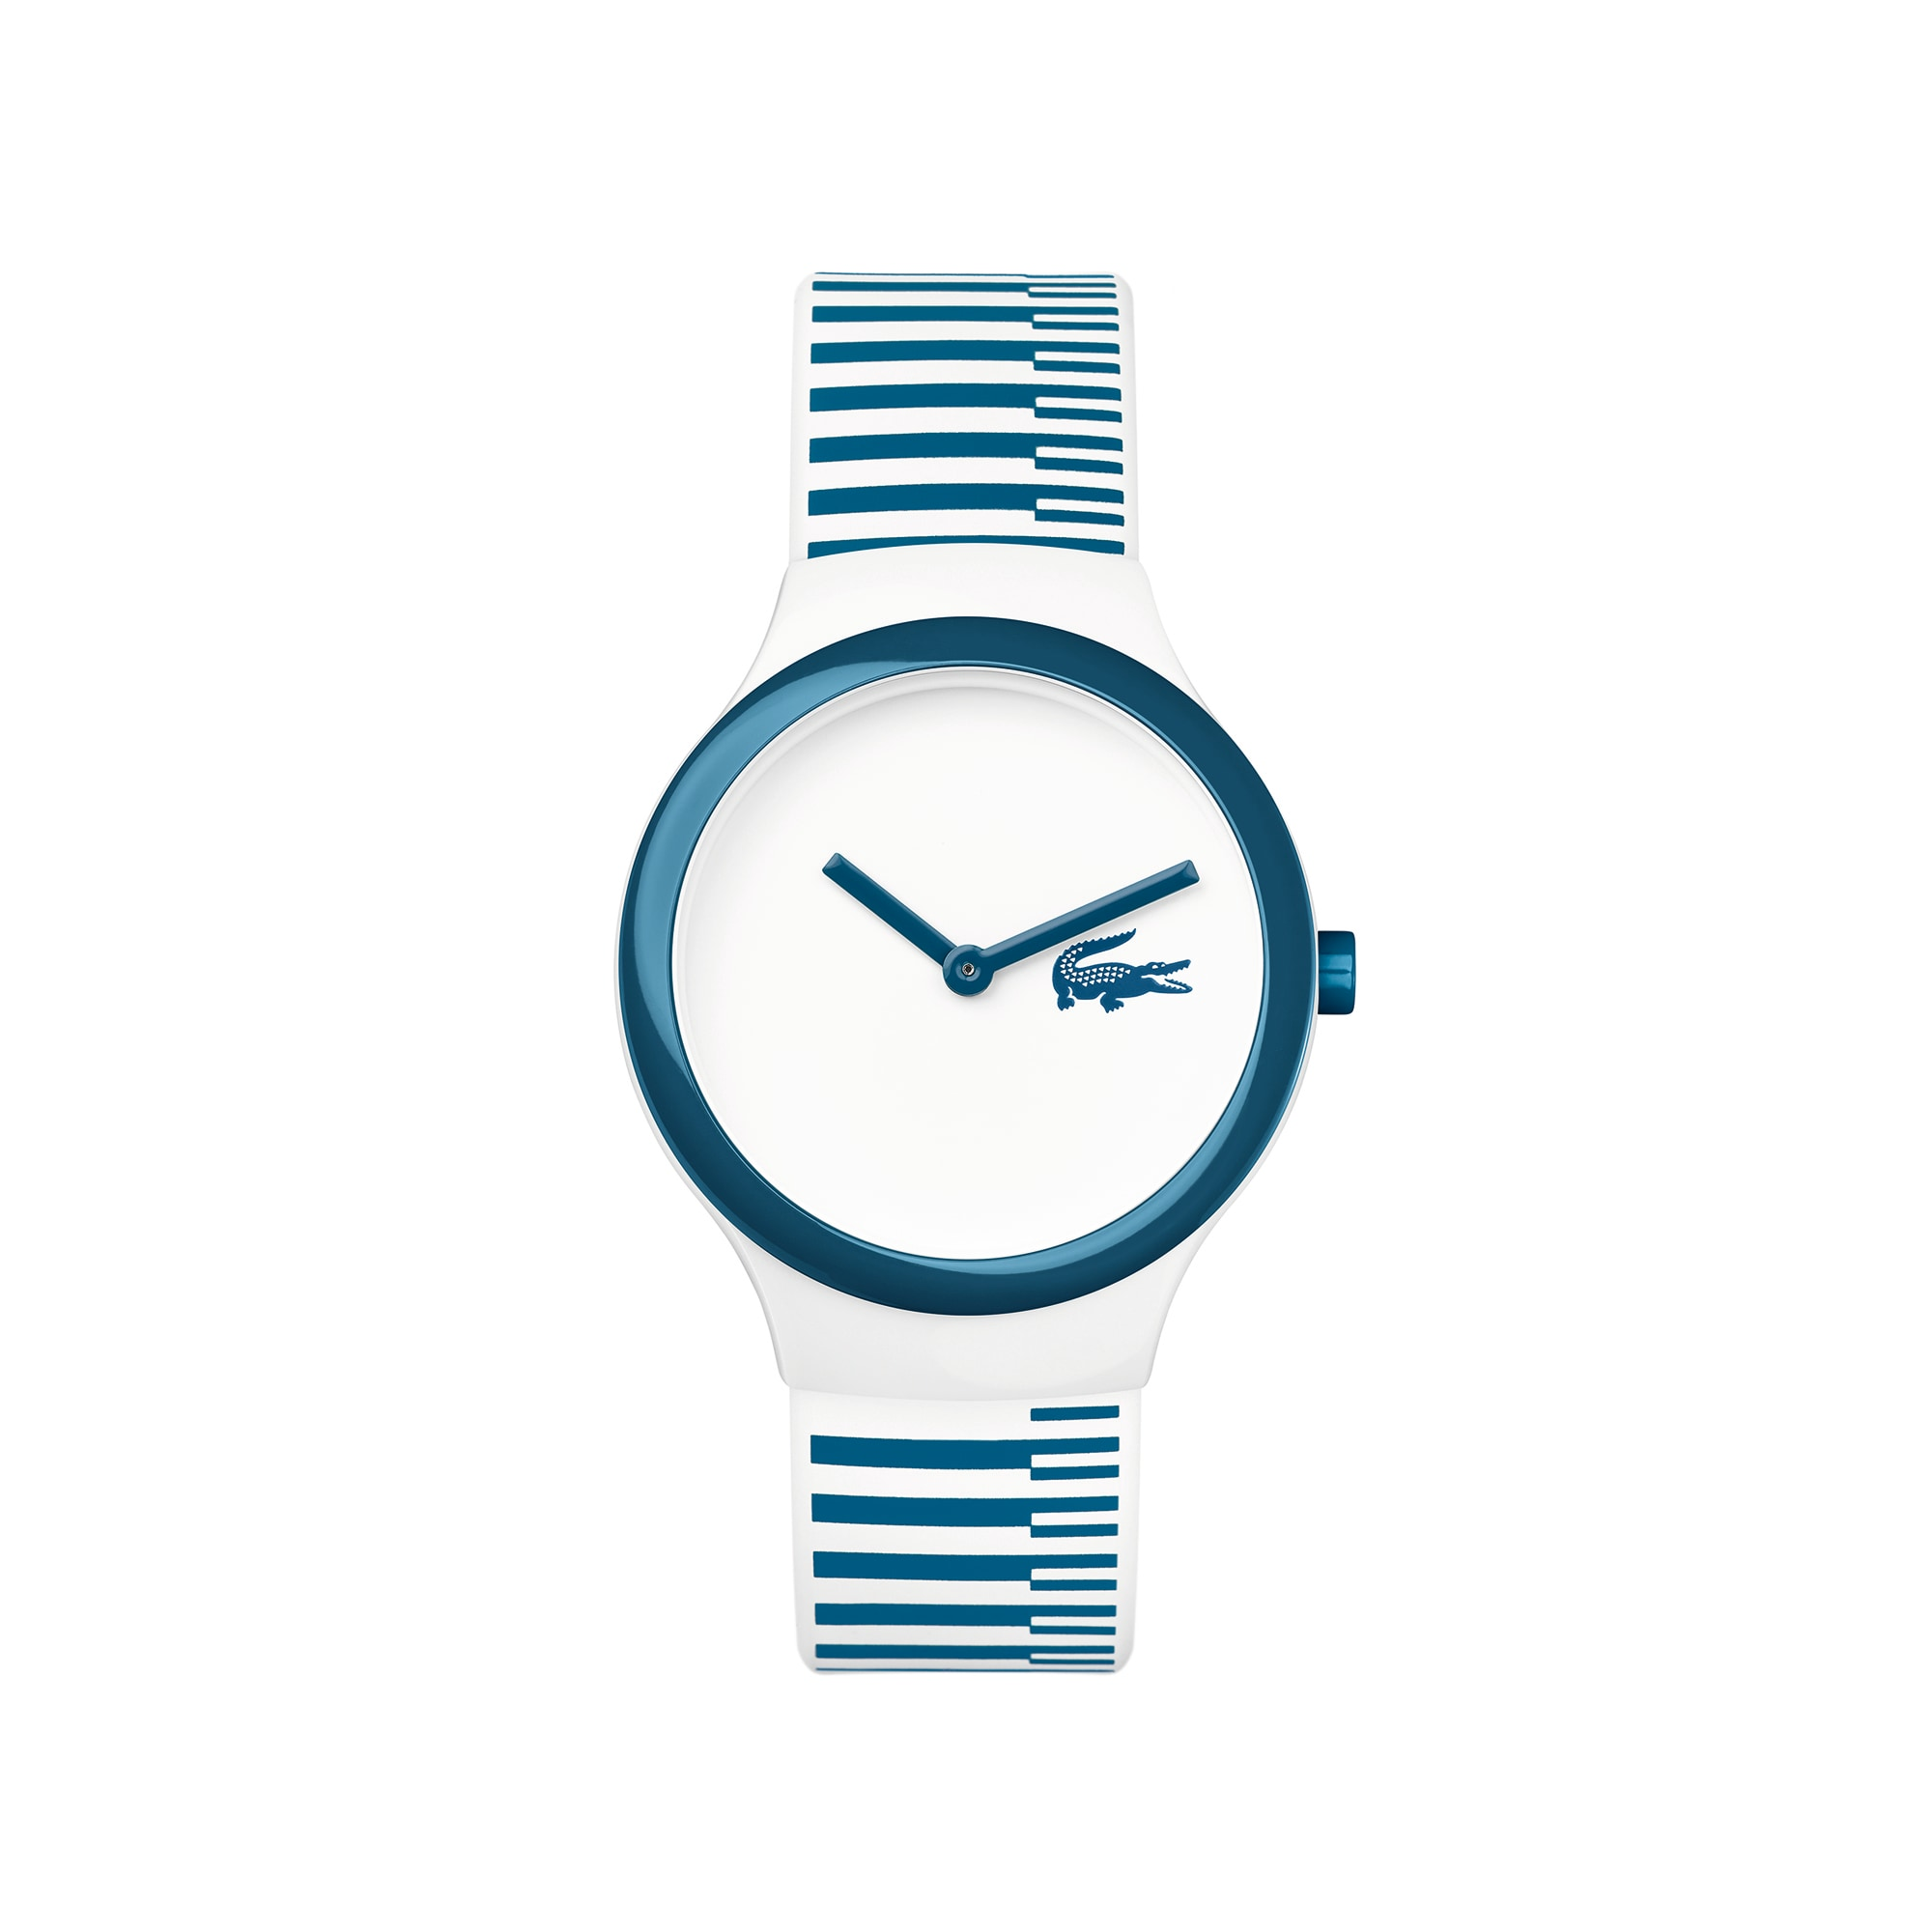 Montre Goa new blanche rayures bleues